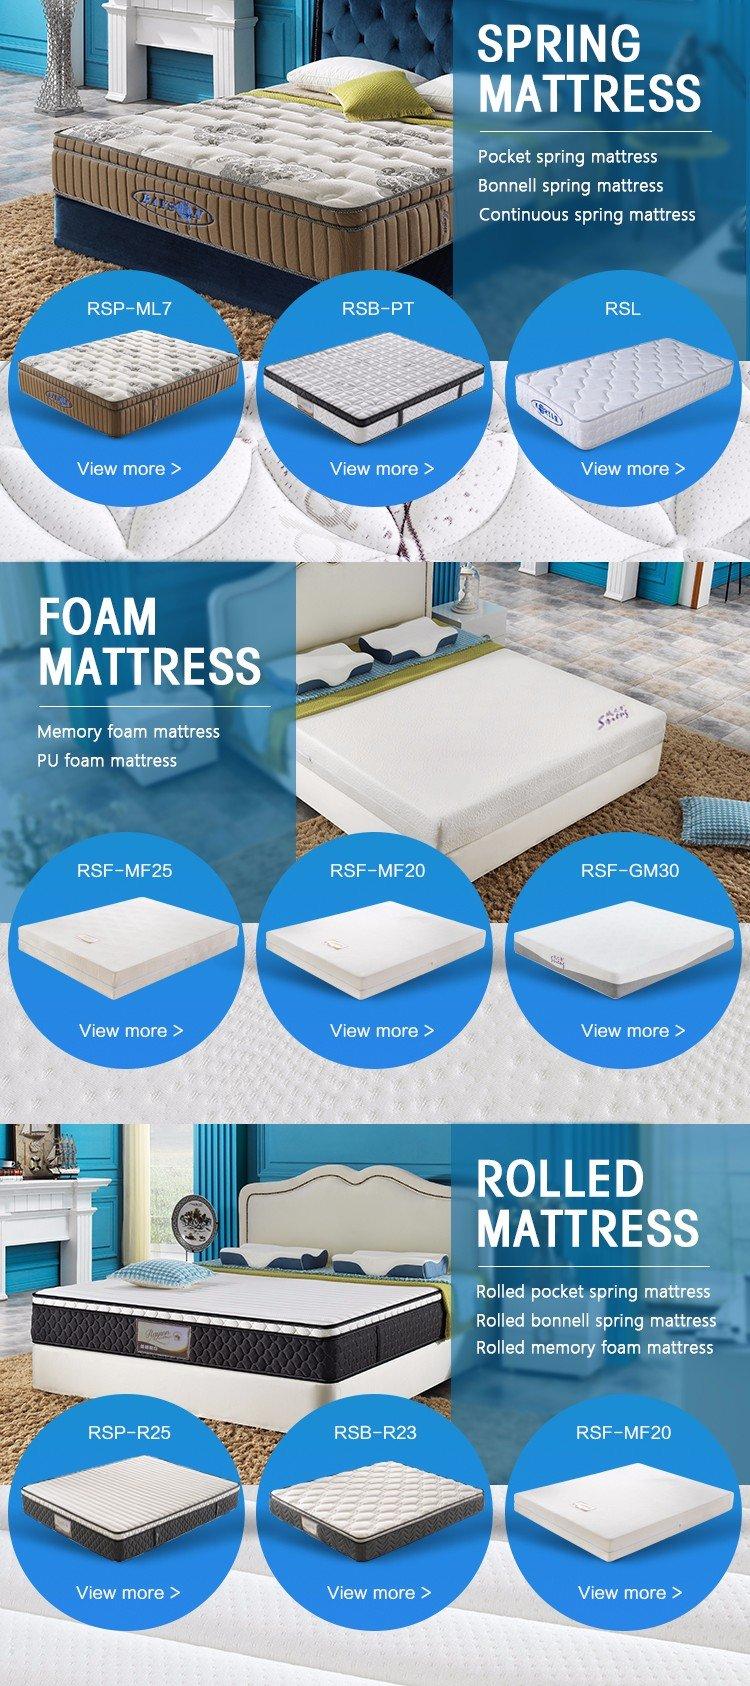 Rayson Mattress Wholesale pocket spring mattress Suppliers-7